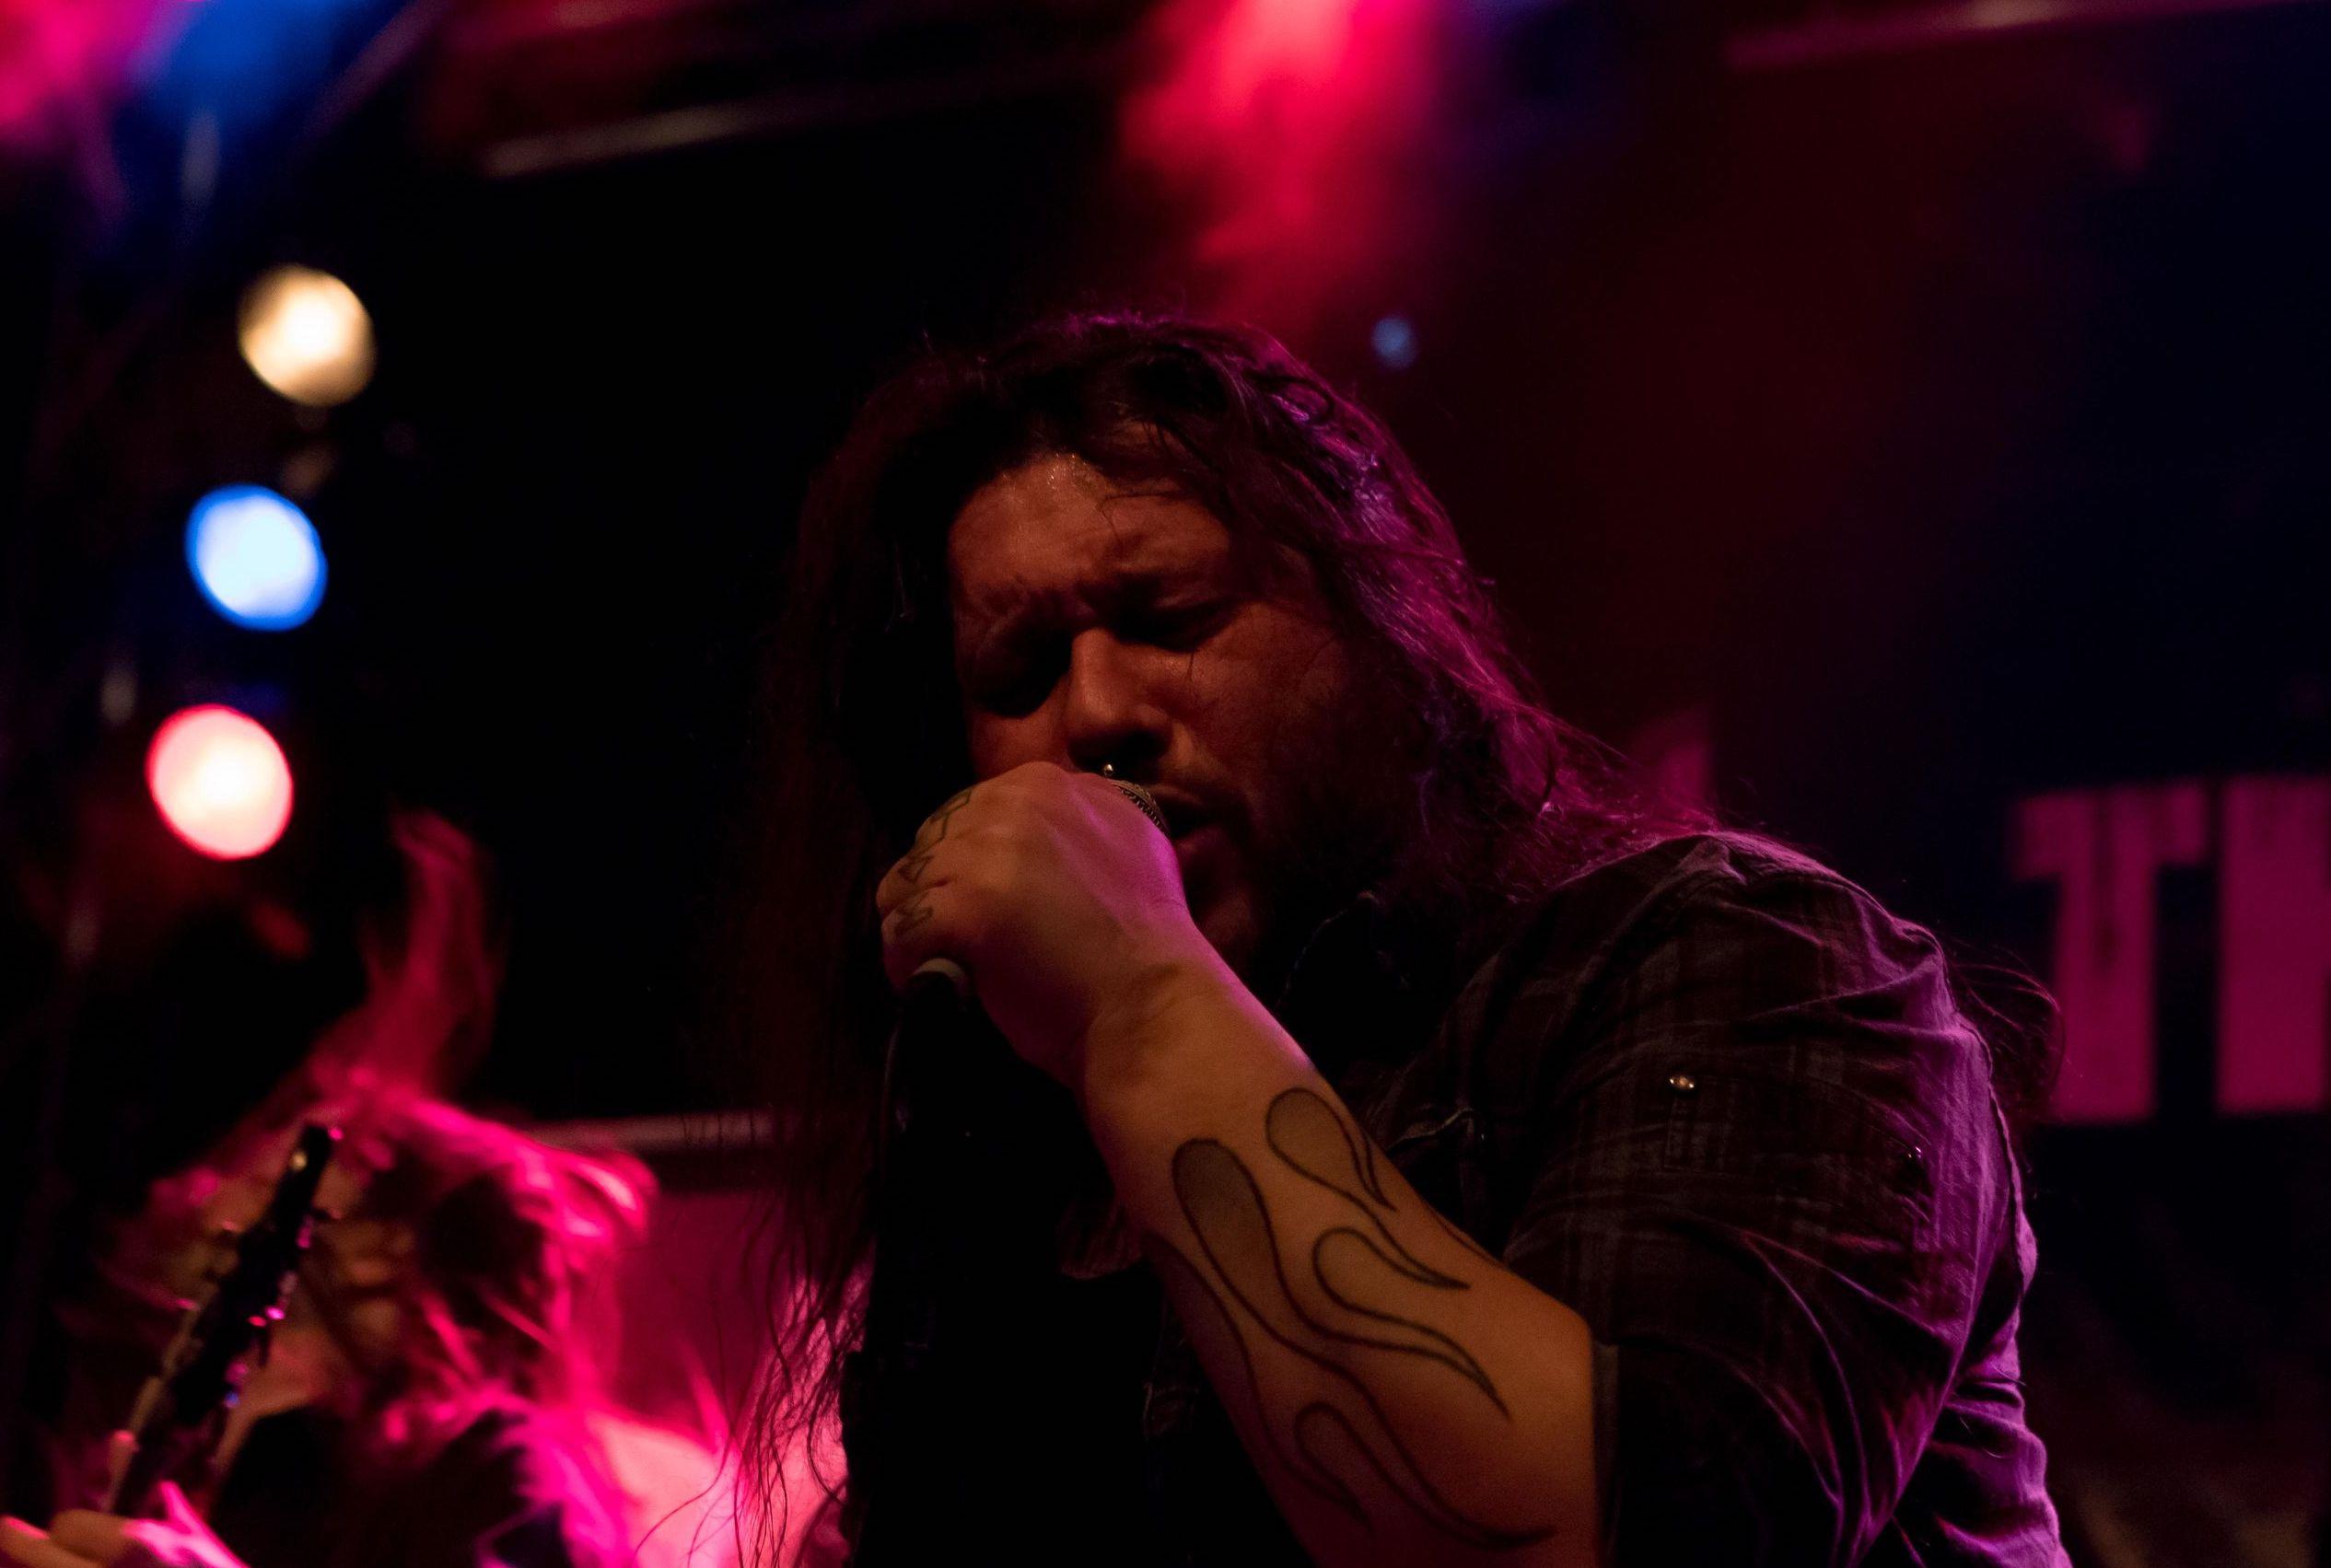 the-very-end-live-zeche-carl-essen-germany-thrash-metal_1